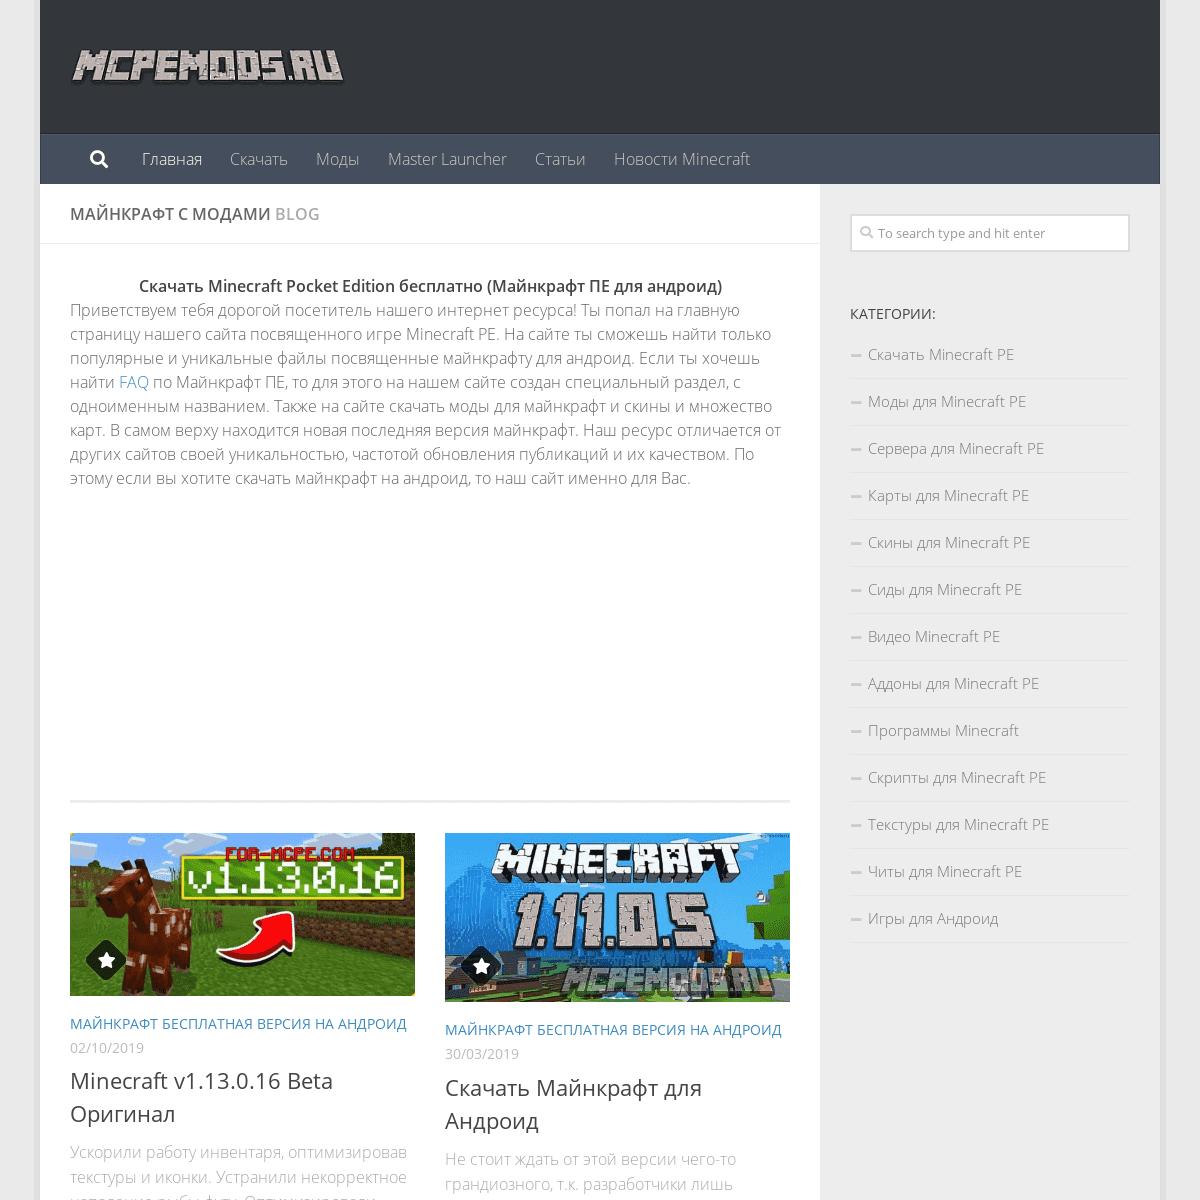 Скачать Майнкрафт бесплатно с модами - Майнкрафт для Андроид